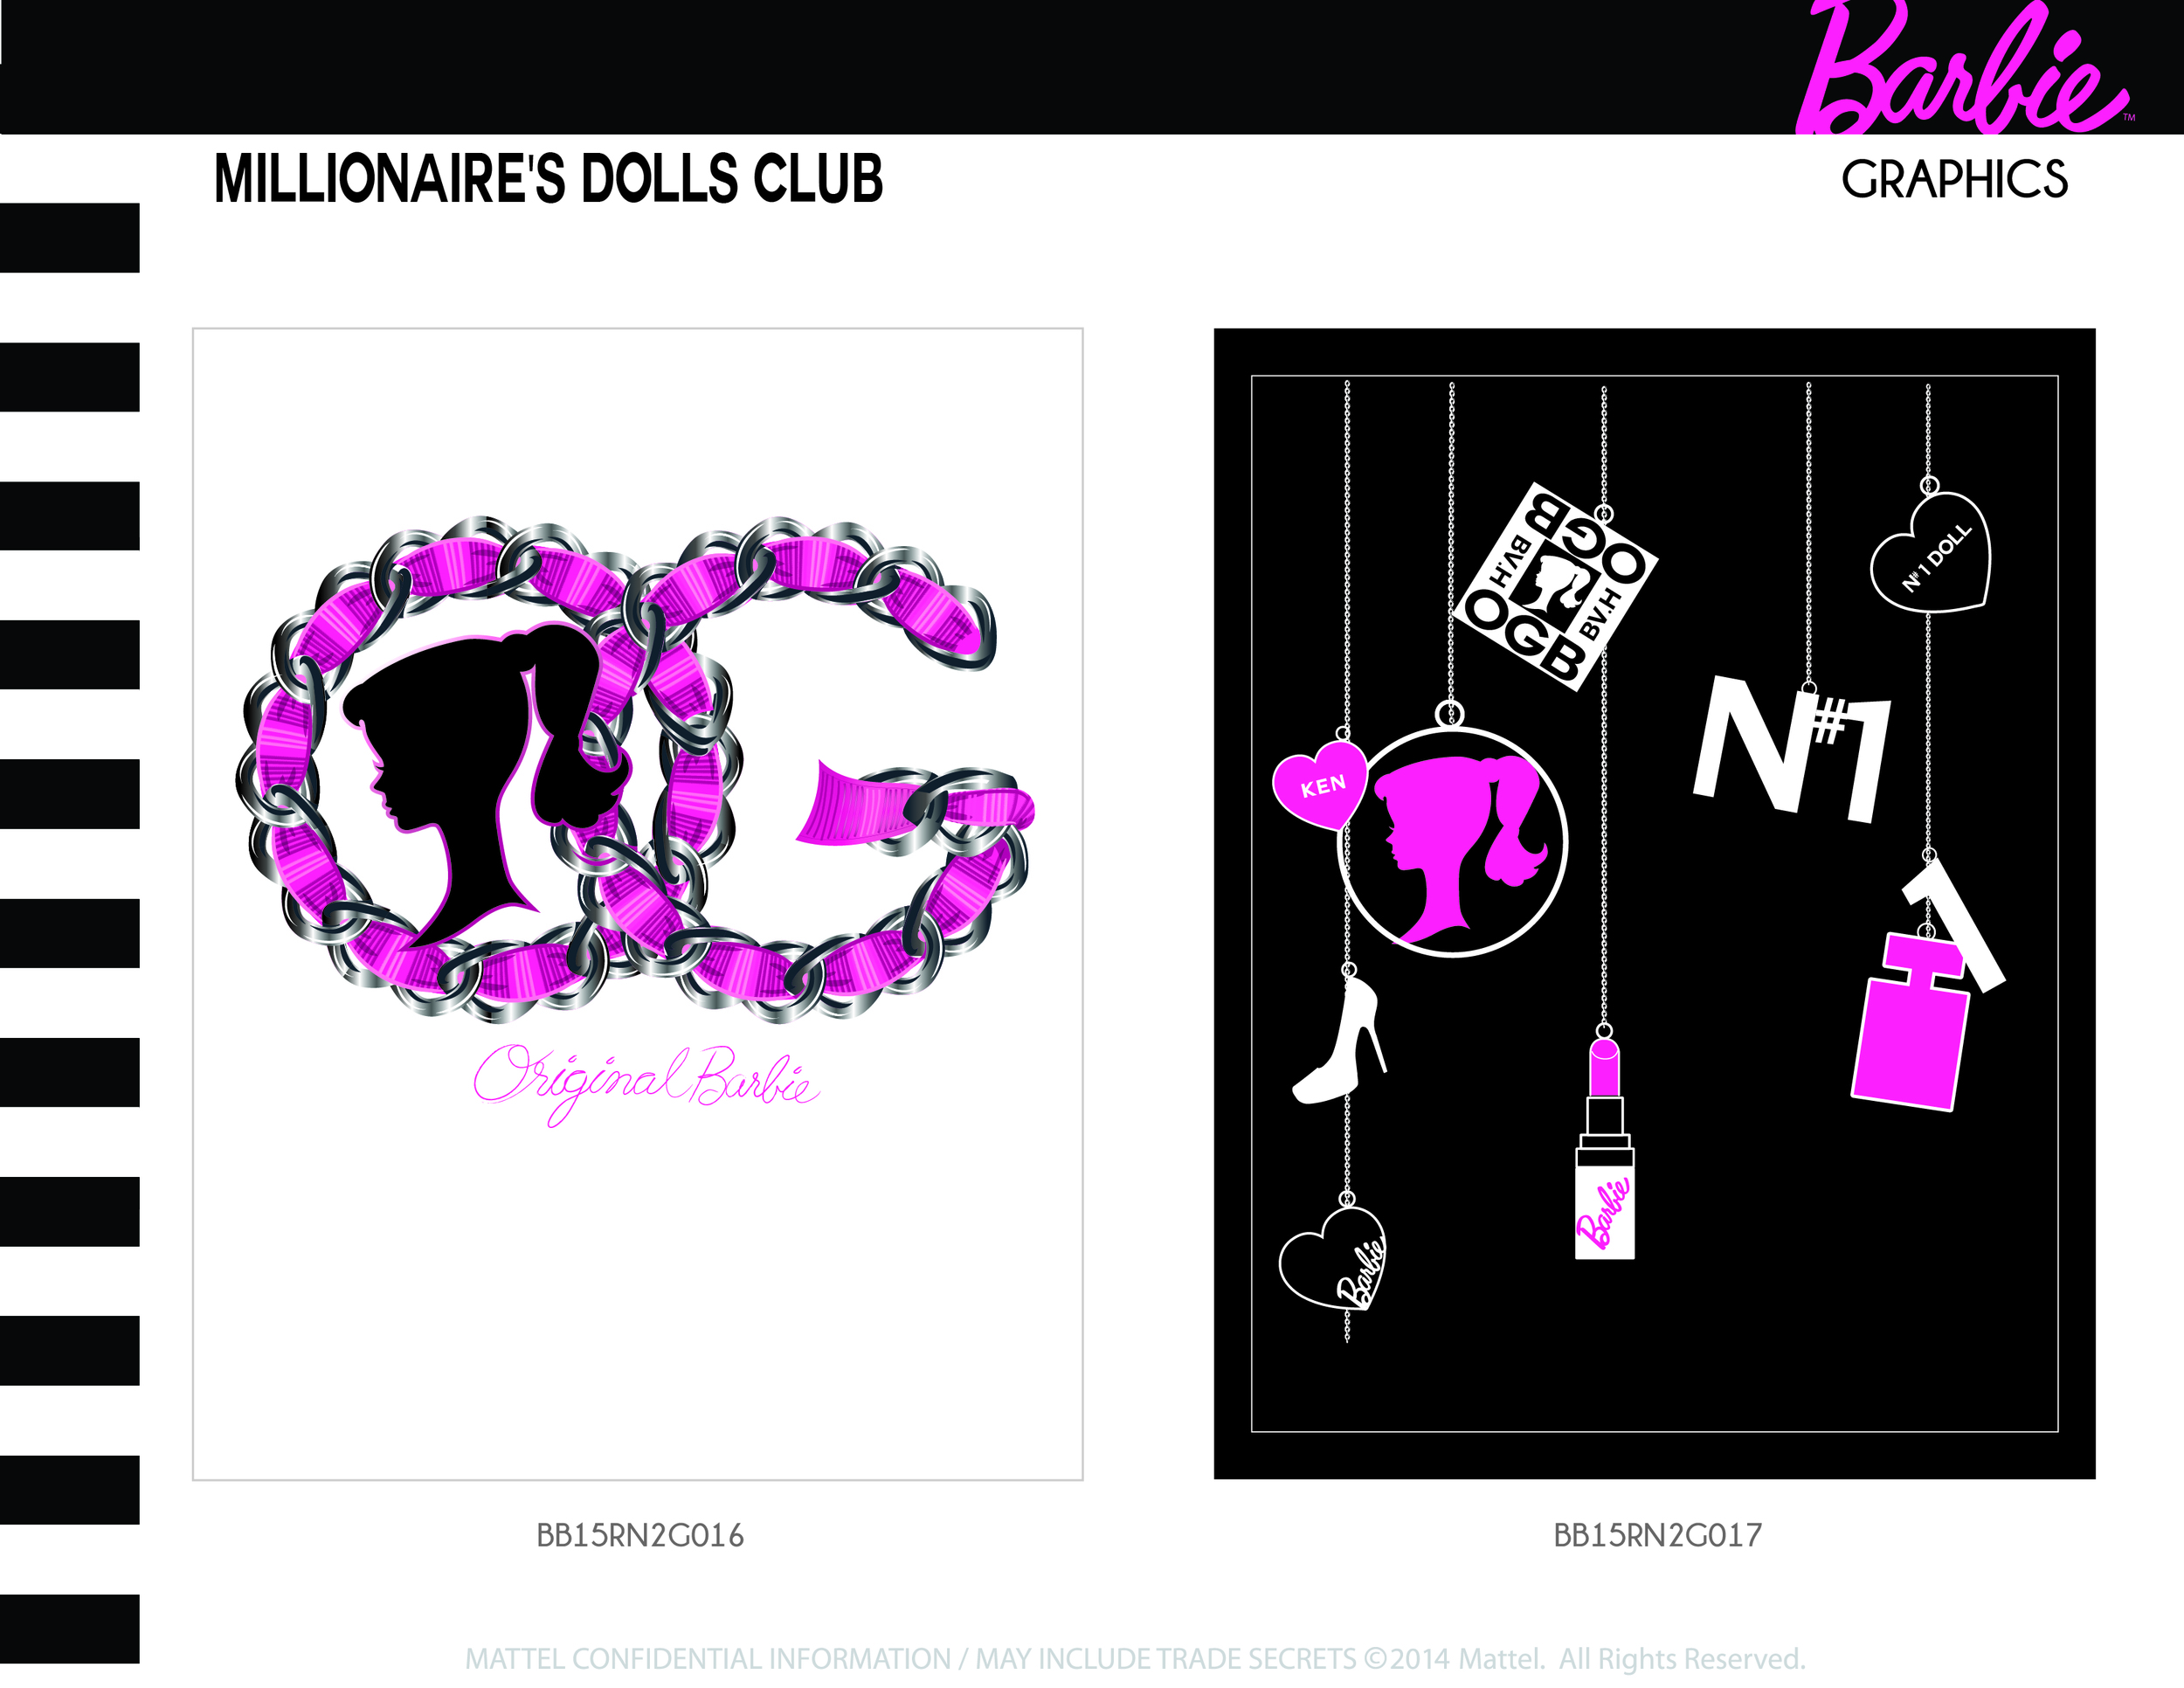 Millionaire's Dolls Club Graphics 5-6